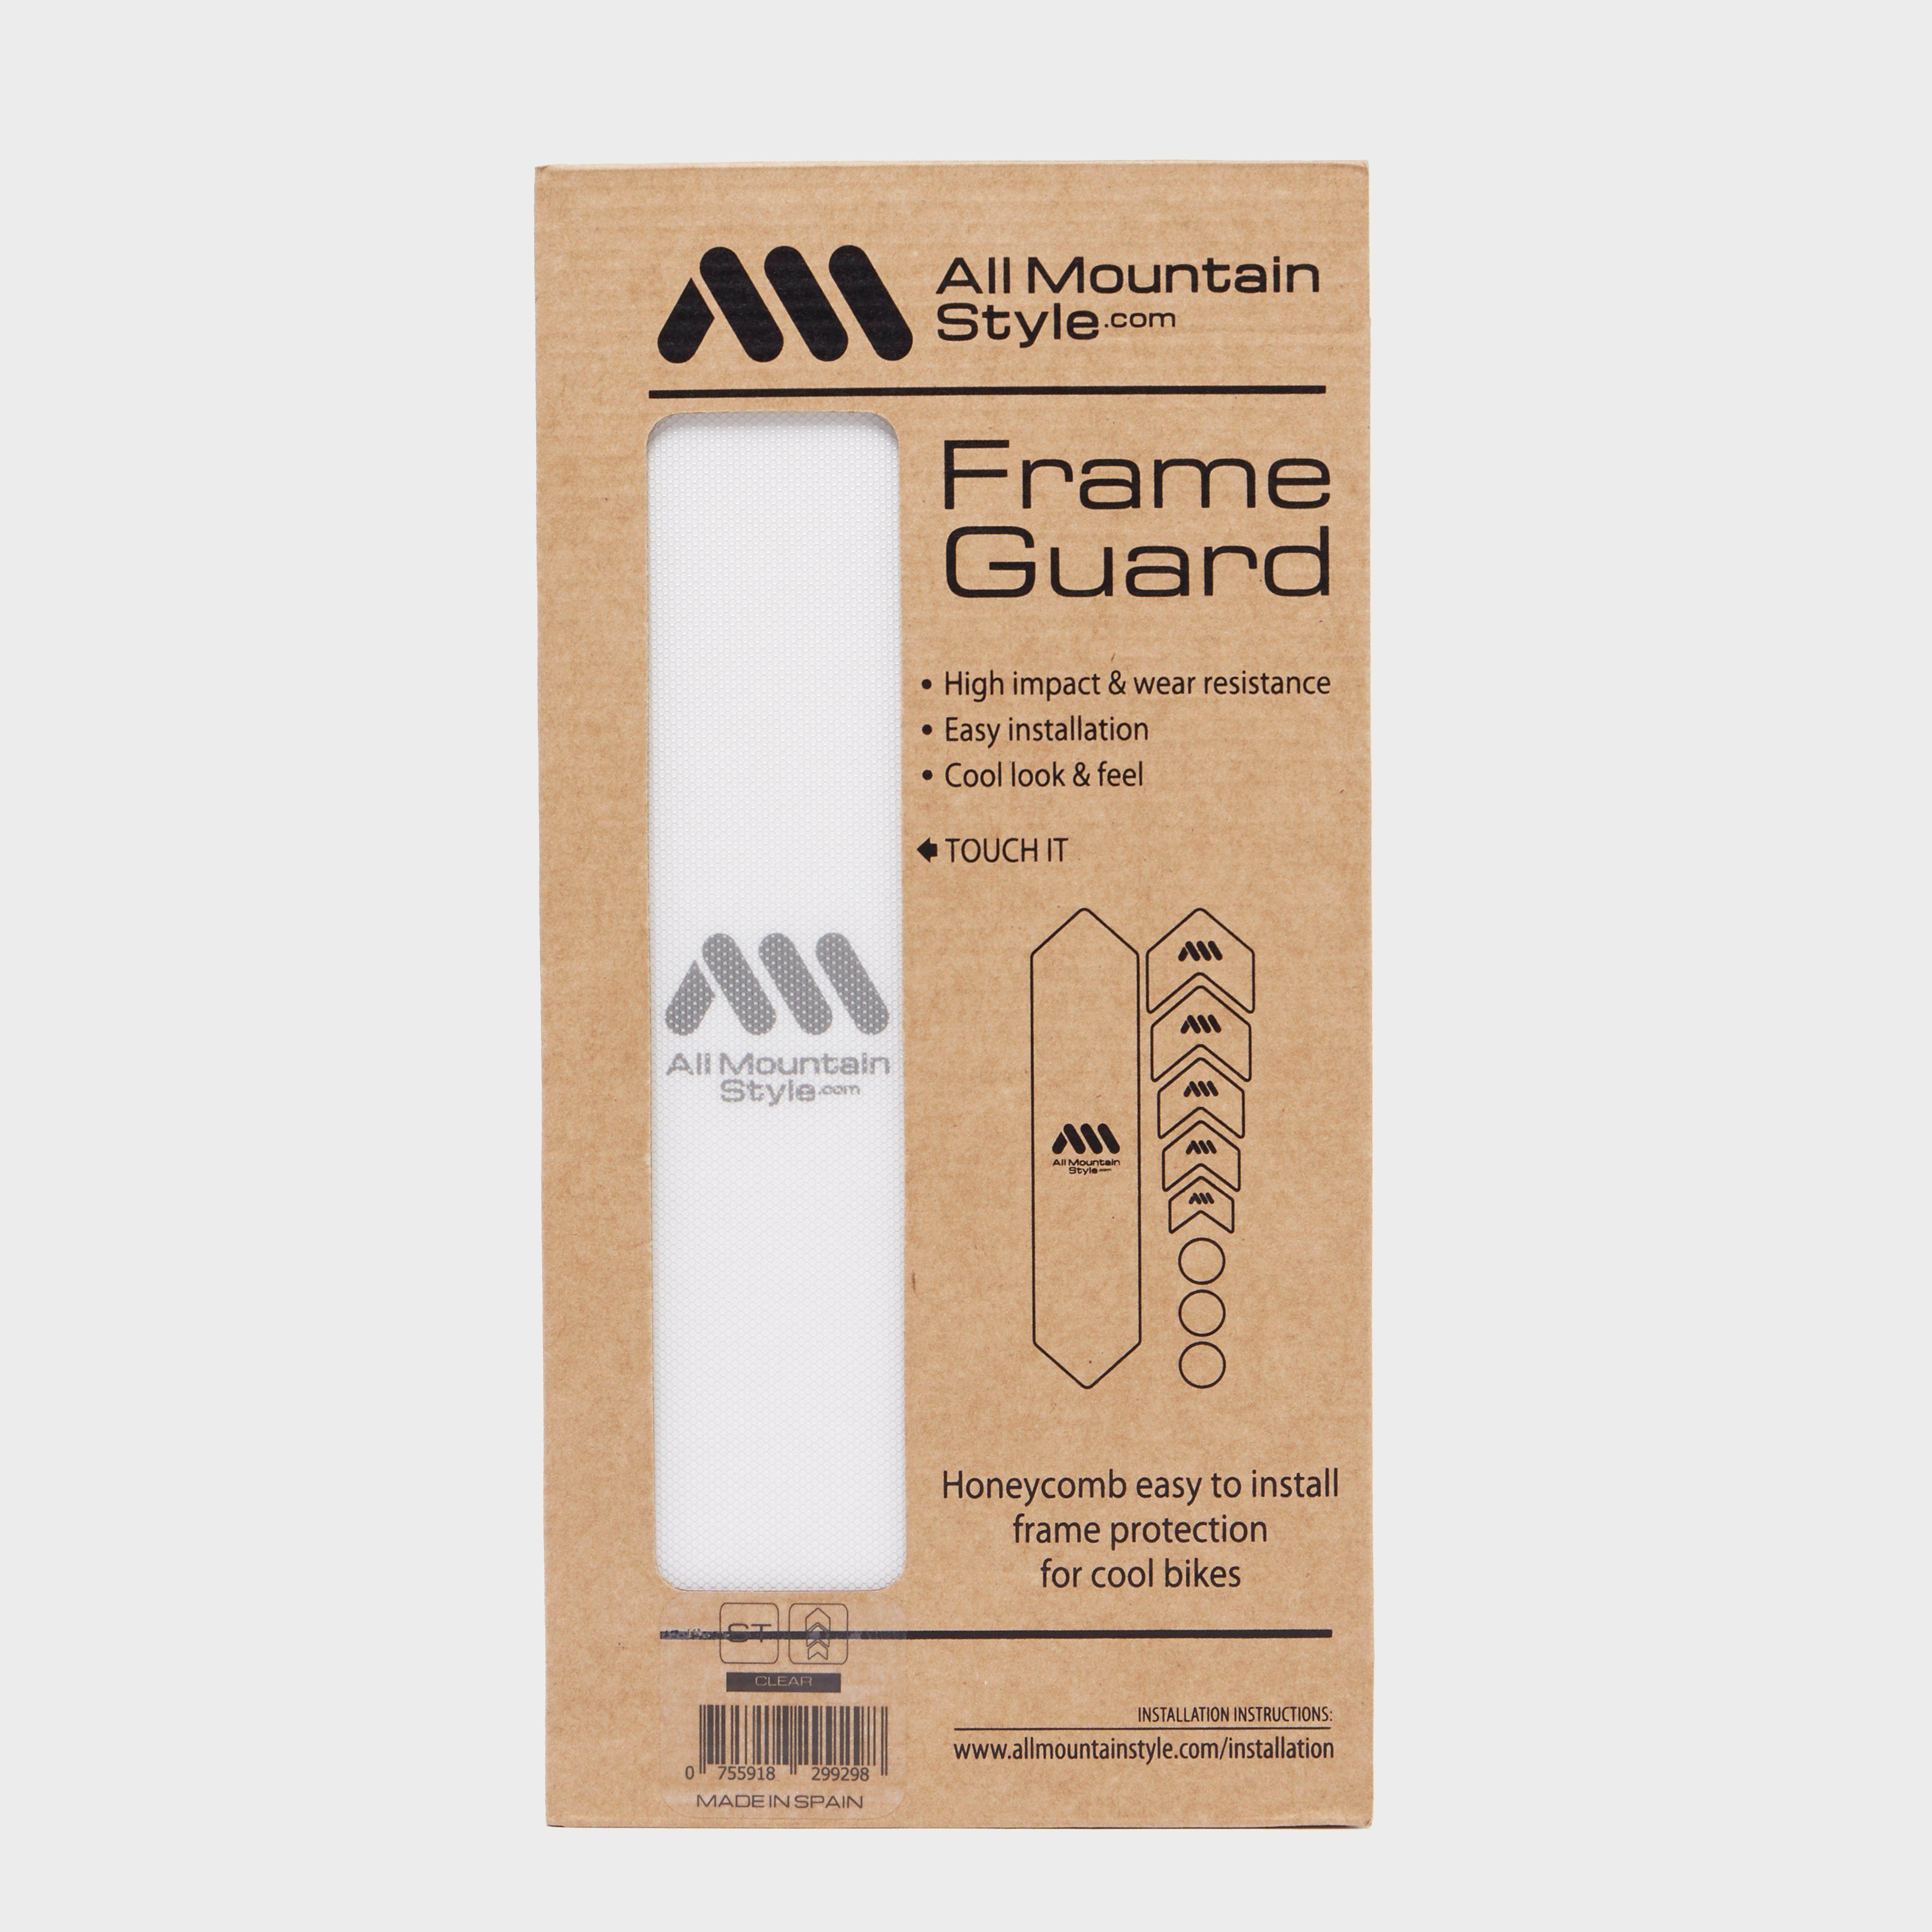 AMS Honeycomb Frame Guard Kit